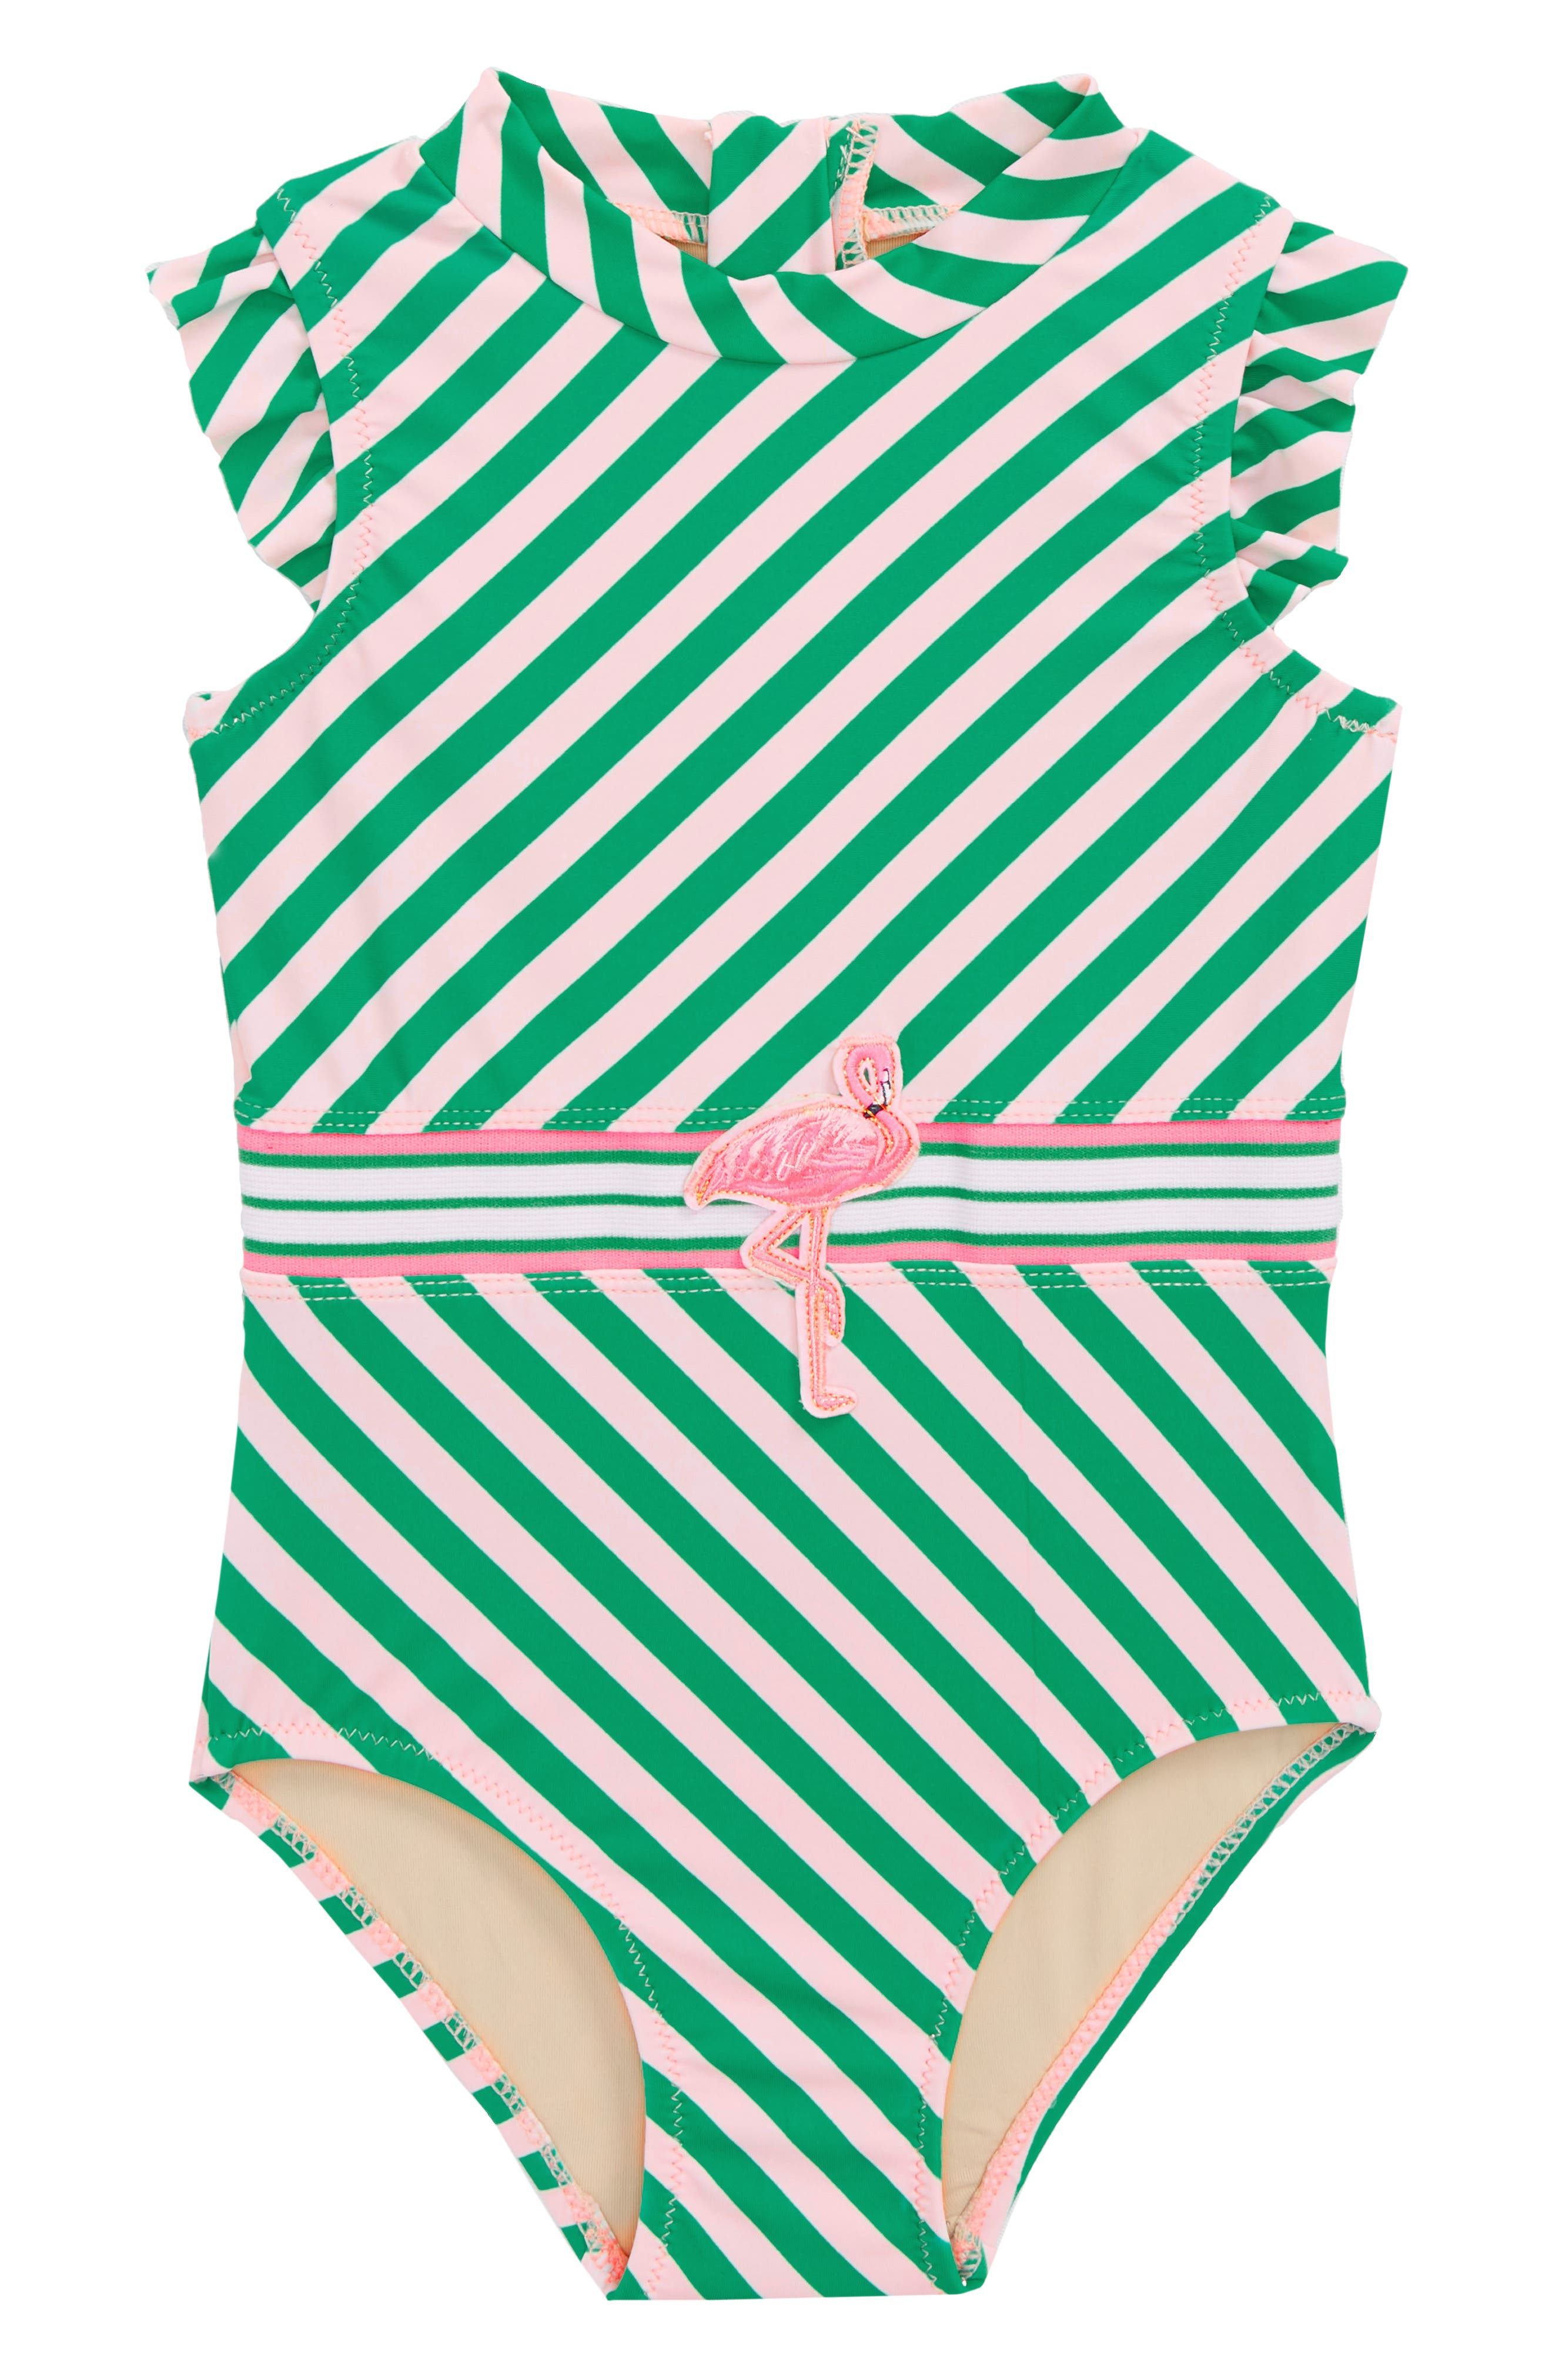 Main Image - Shade Critters Flamingo Belt One-Piece Swimsuit (Toddler Girls & Little Girls)